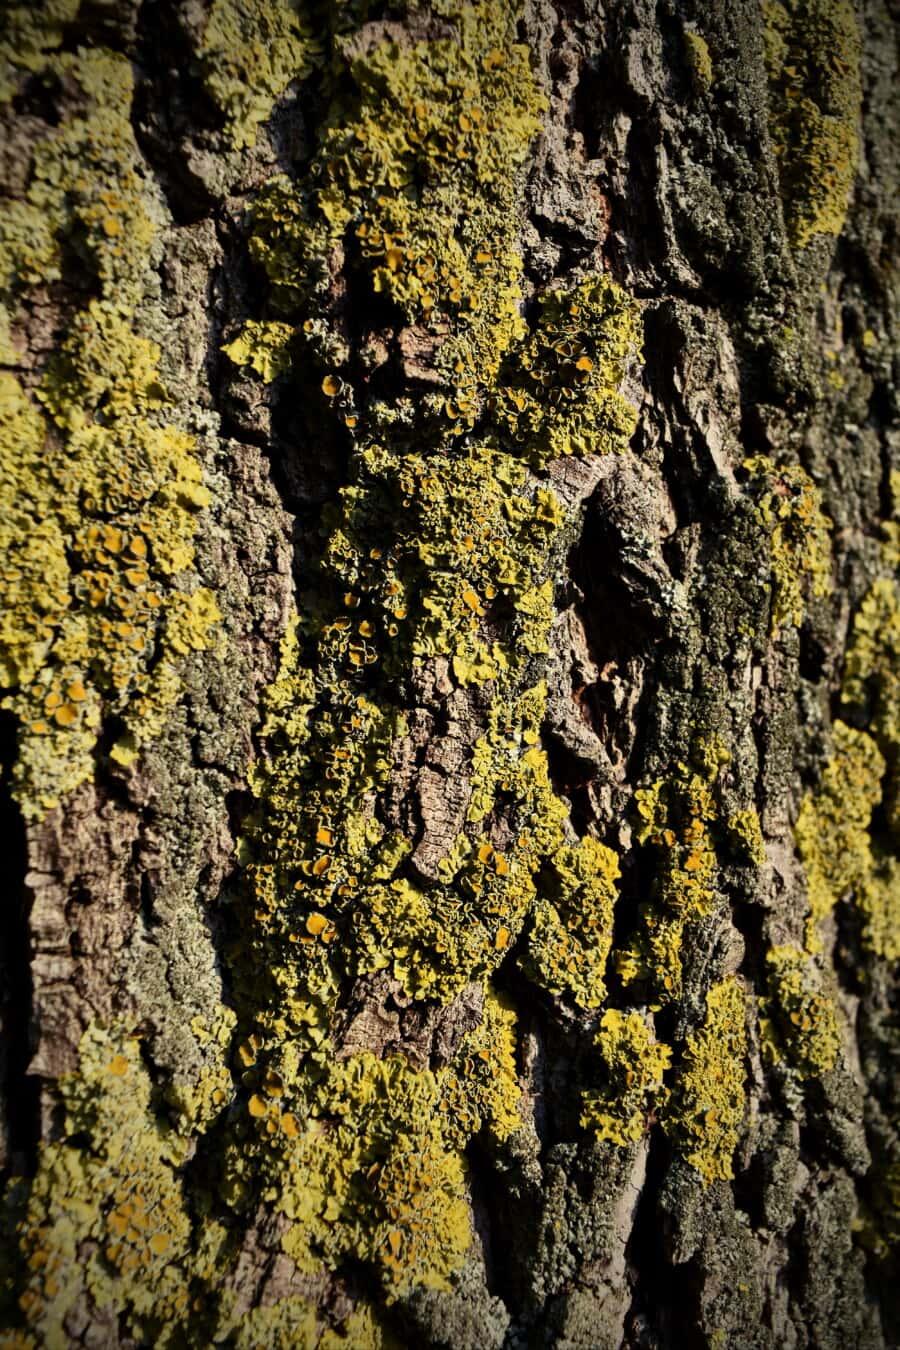 mossy, tree, bark, lichen, texture, cortex, moss, wood, fungus, nature